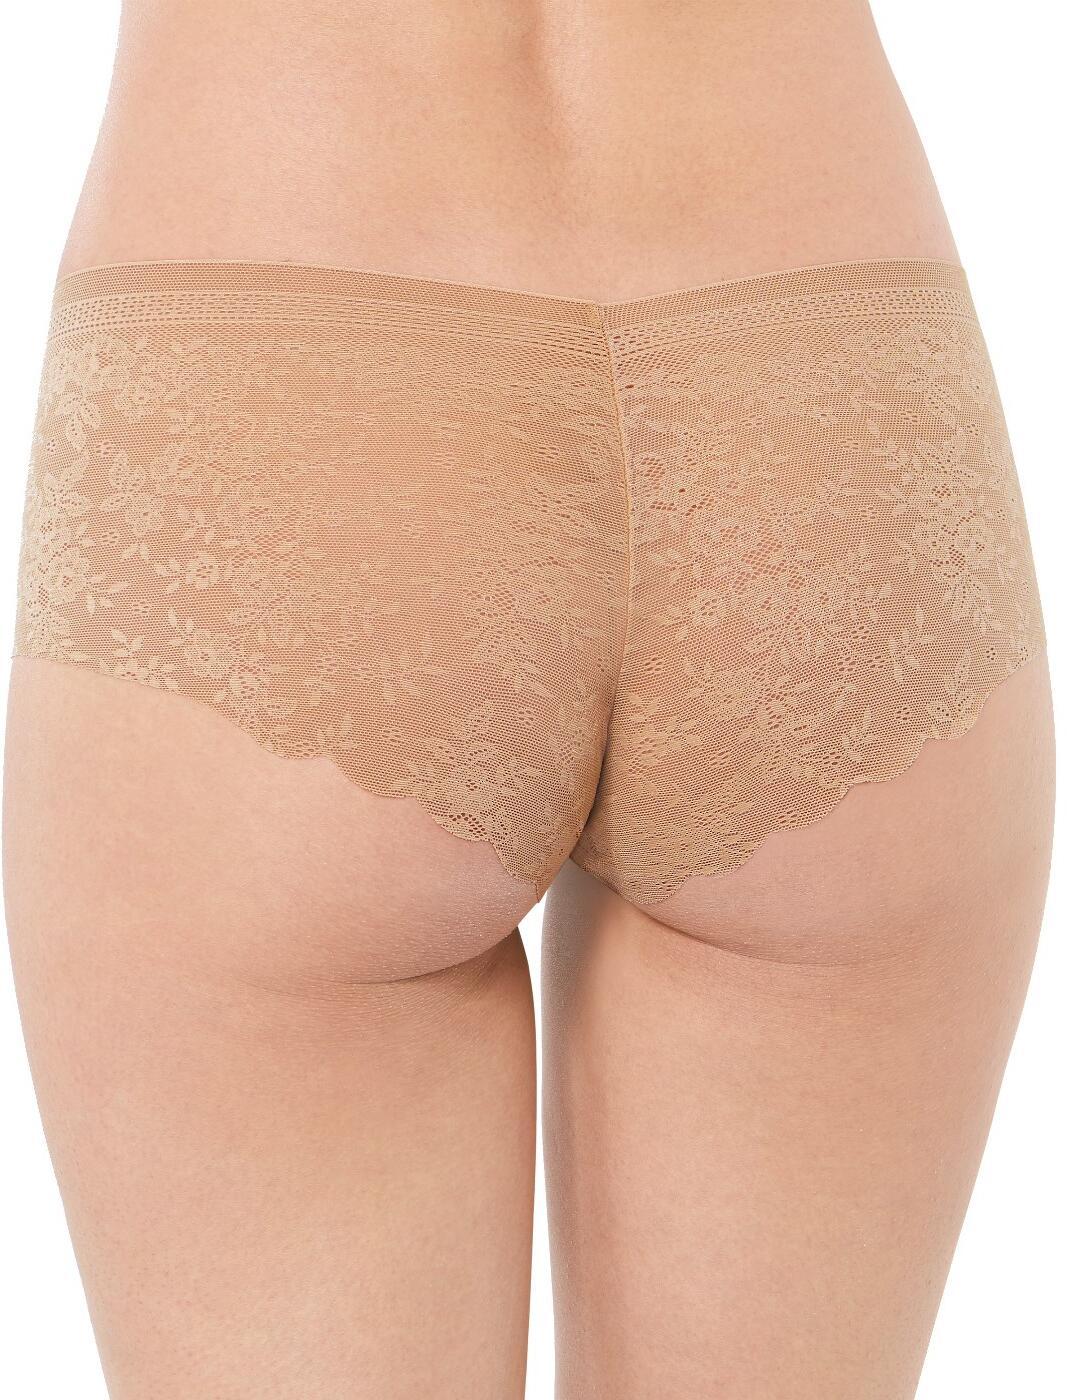 Sloggi ZERO Lace Short Brief 10186060 Womens Soft Touch Everyday Lingerie